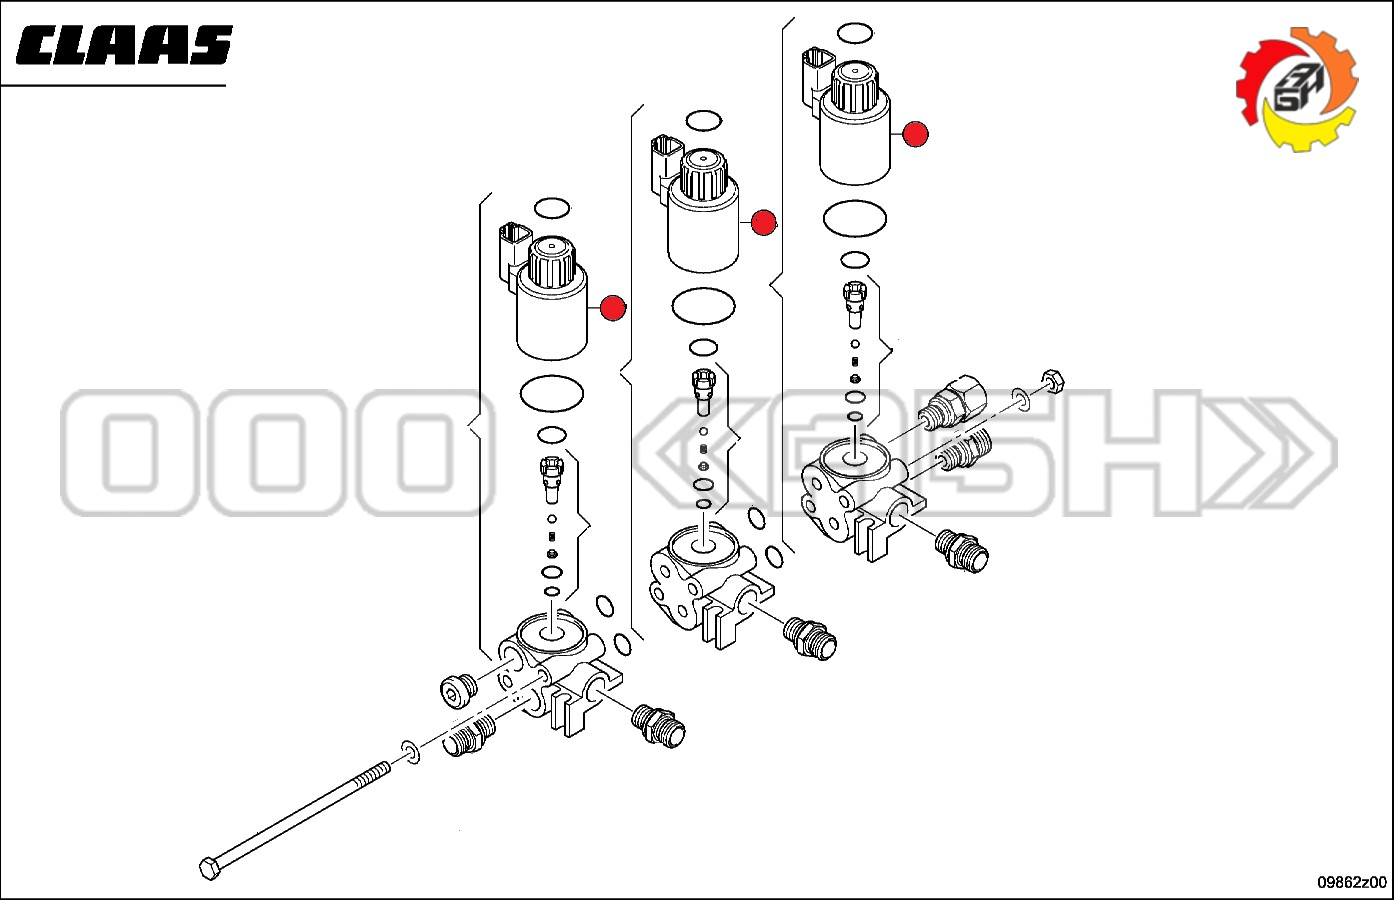 Соленоид Claas (0000404450 / 0000397420 / 0404450 / 0397420)